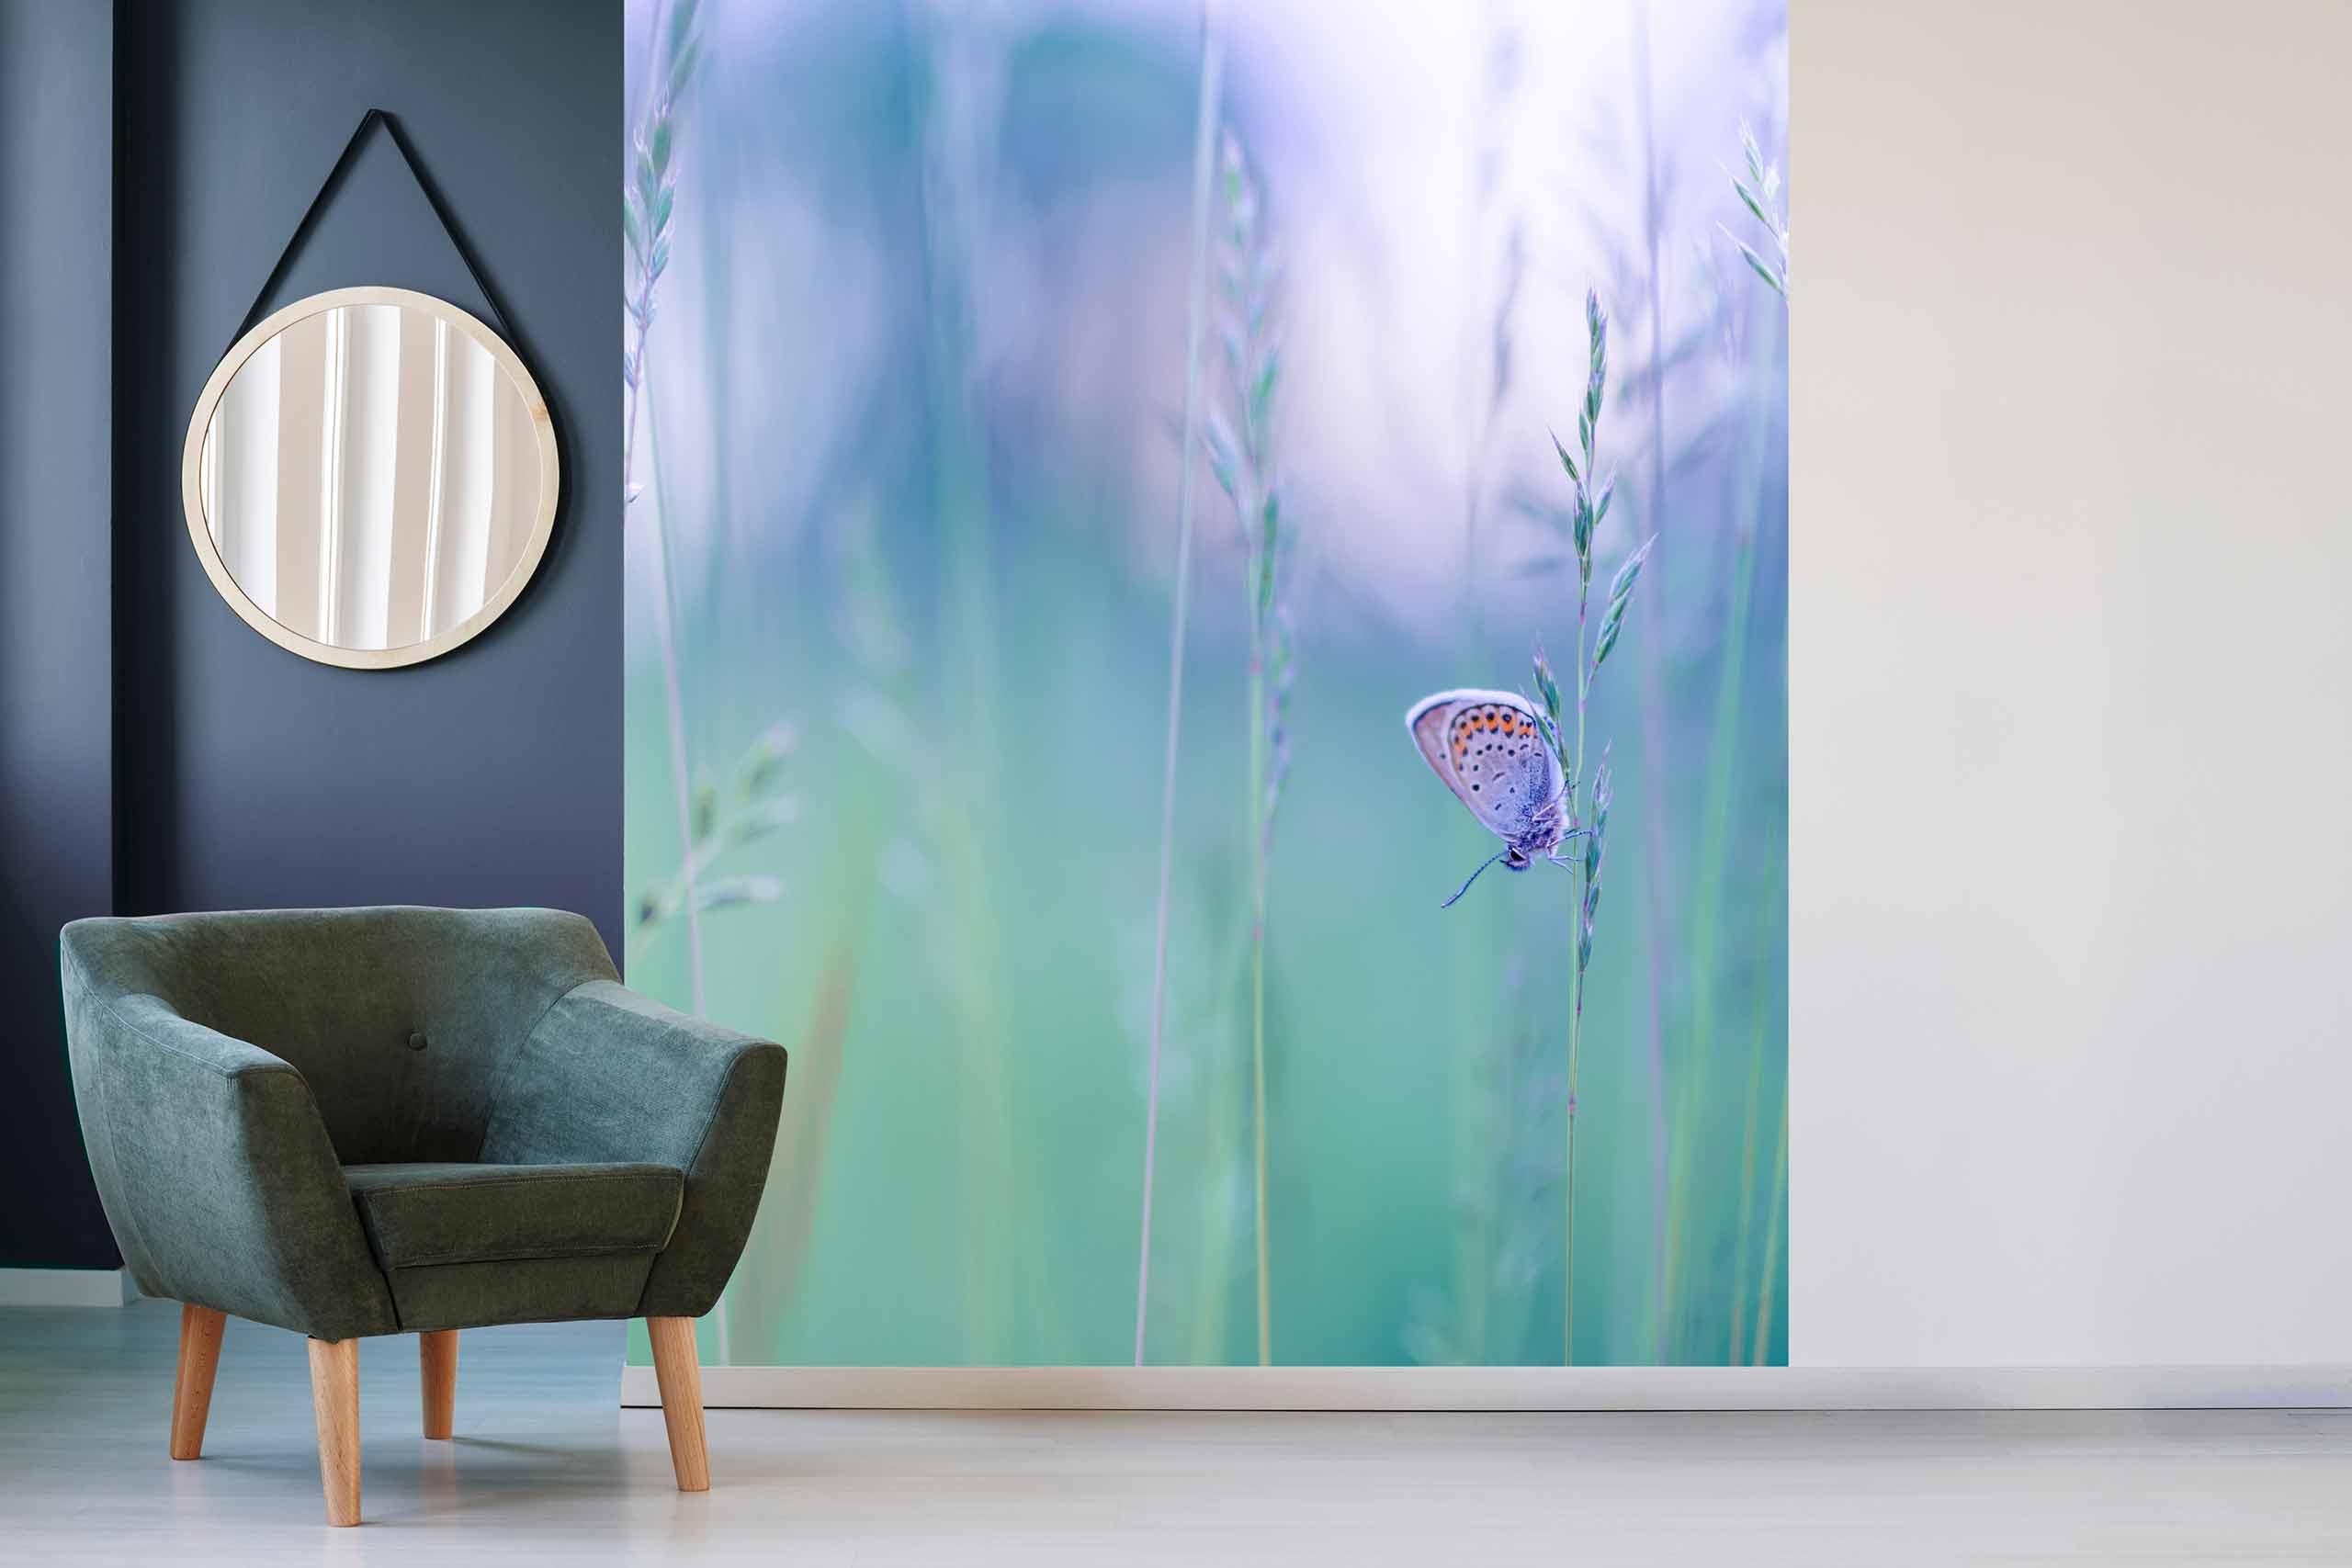 Vlies Tapete 225 Fototapete Höhe 250cm Motiv 131 Schmetterling